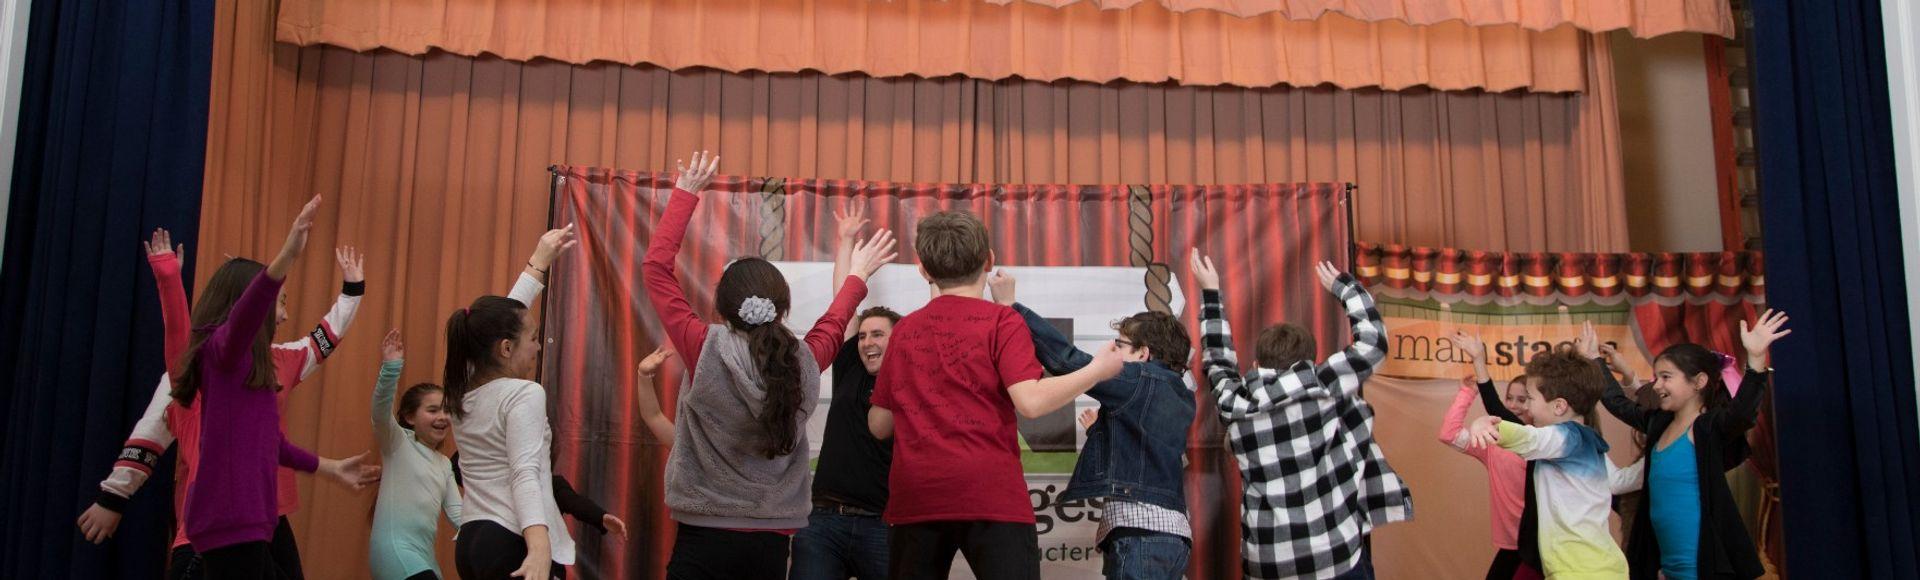 children jumping around on theater stage